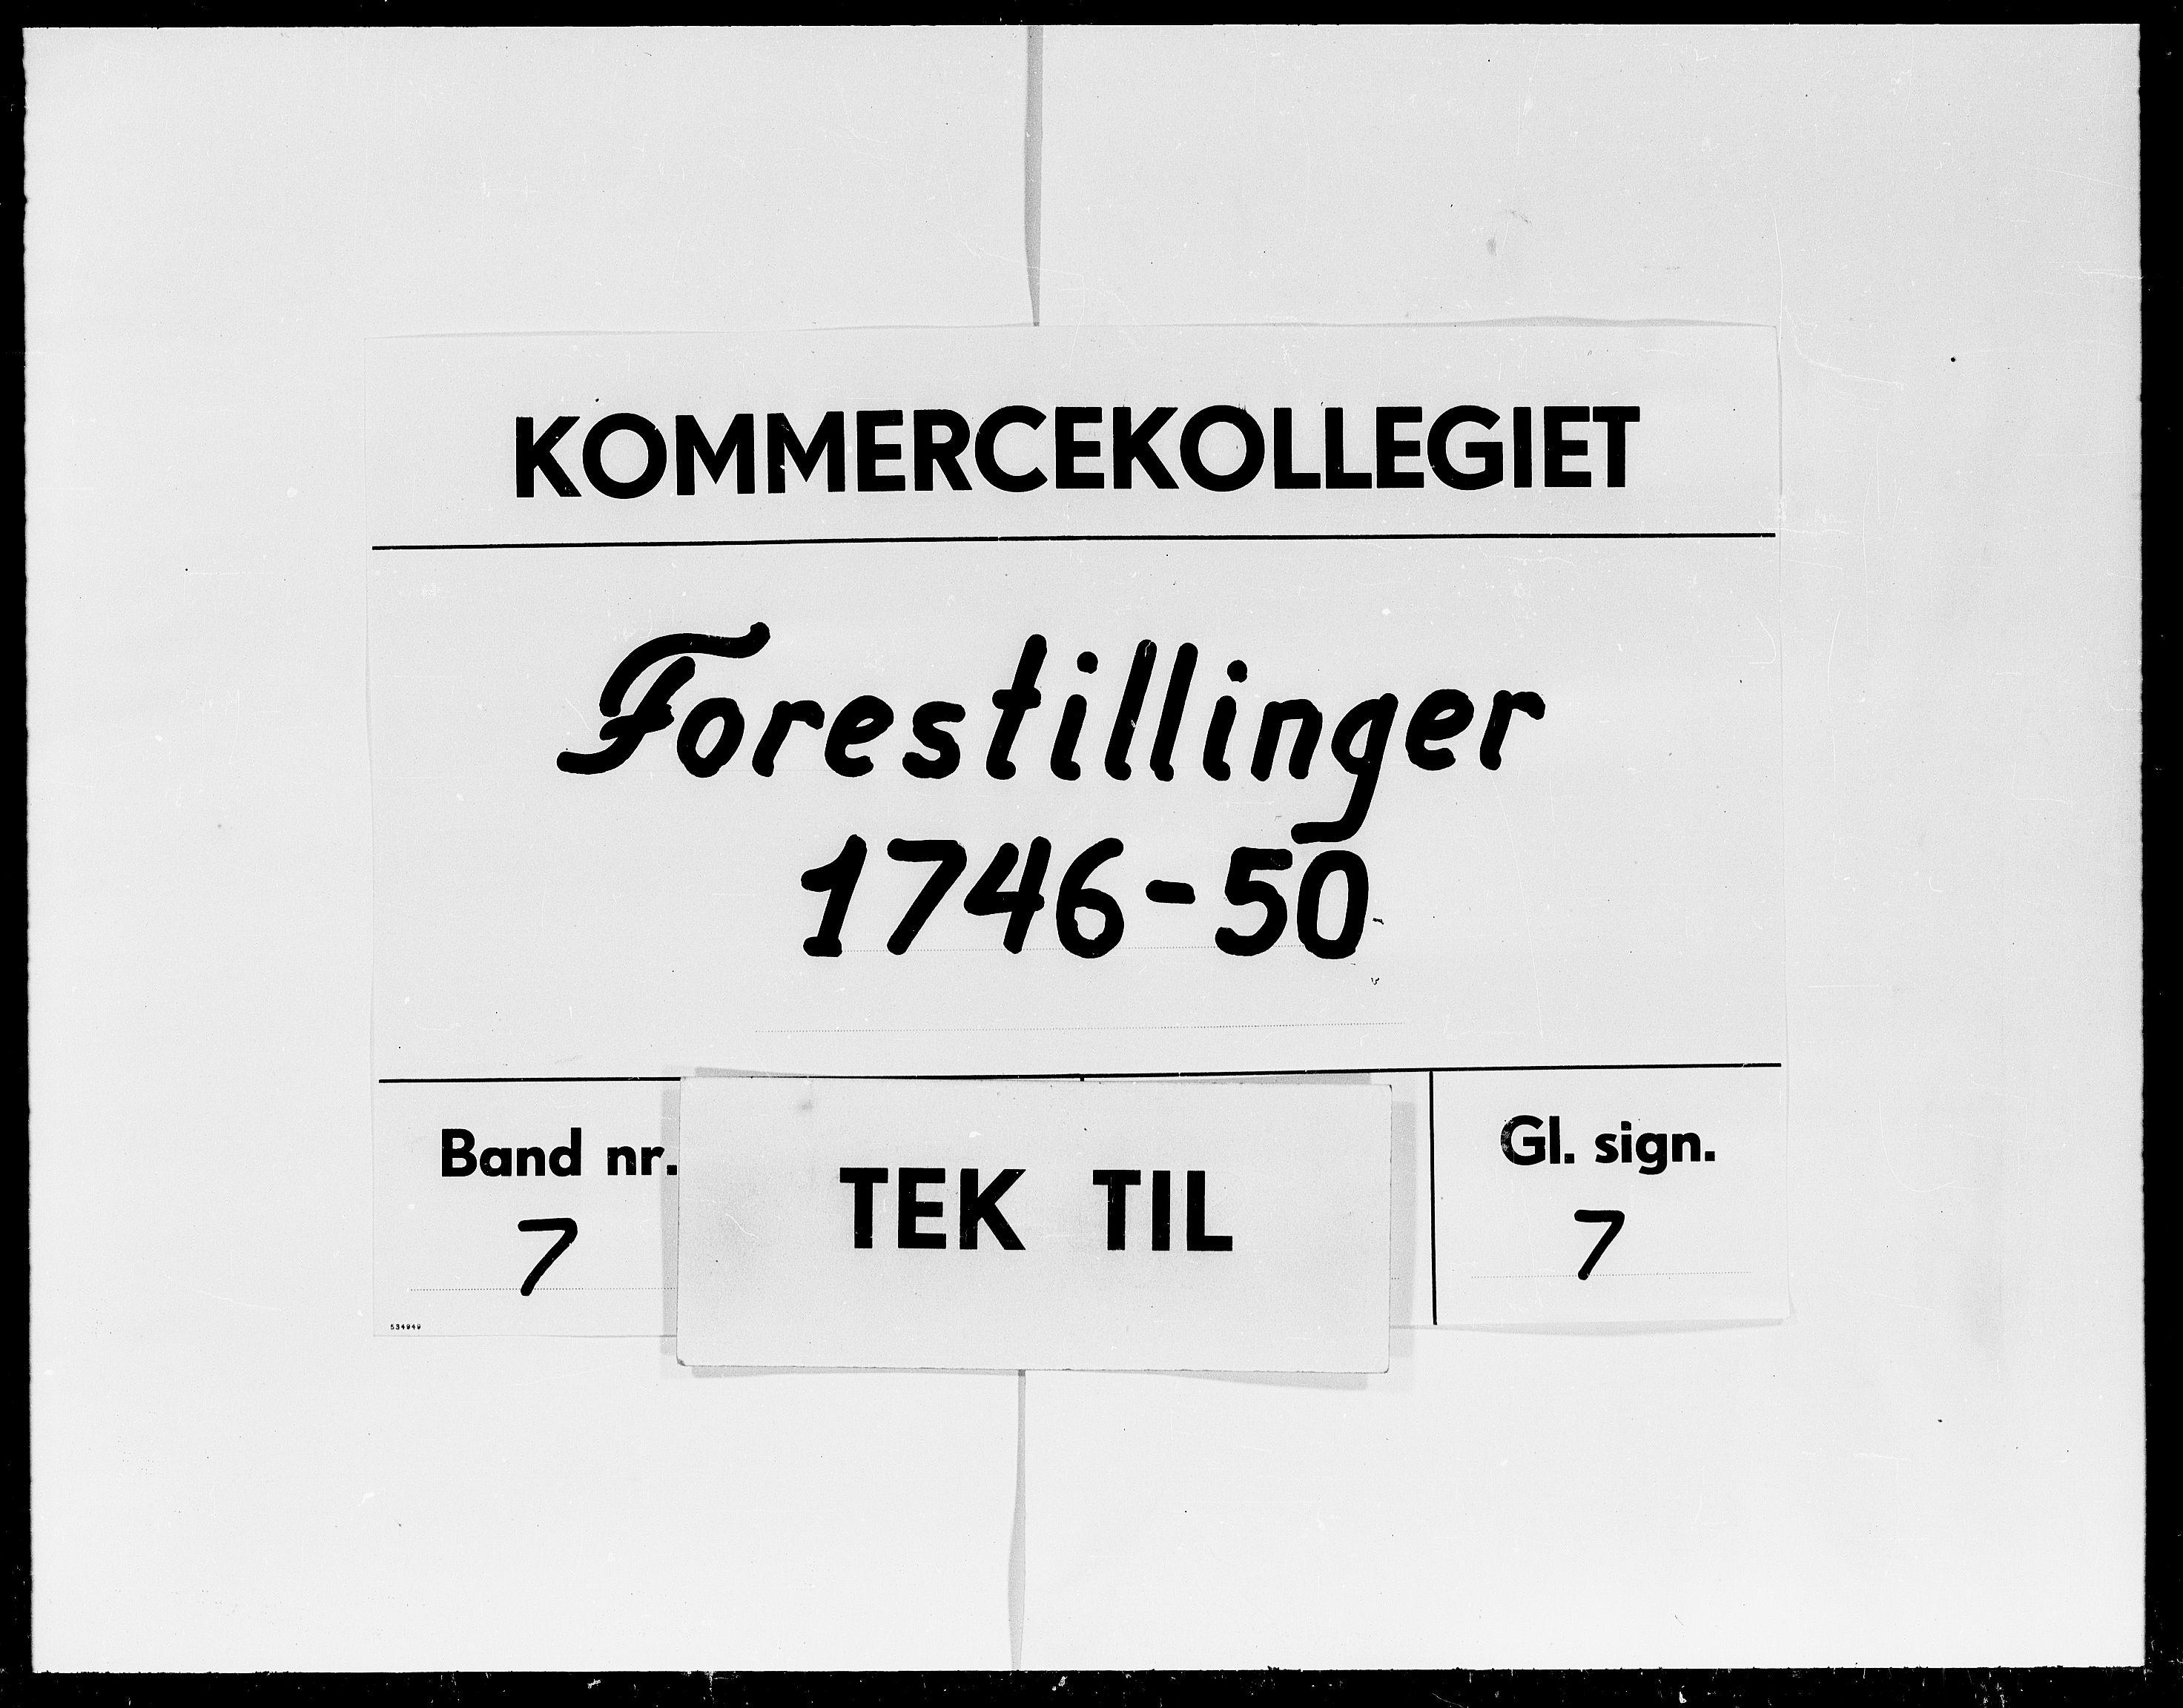 DRA, Kommercekollegiet, Dansk-Norske Sekretariat (1736-1771) / Kommercedeputationen (1771-1773), -/007: Forestillinger, 1746-1750